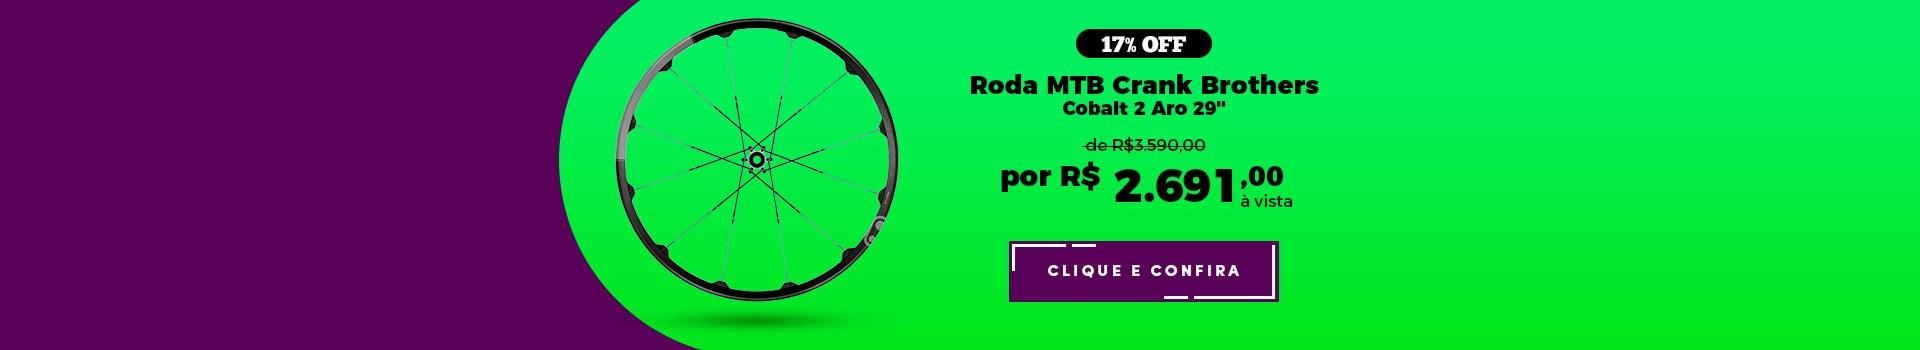 "Roda Bike MTB Crank Brothers Cobalt 2 Aro 29"" em promoção"